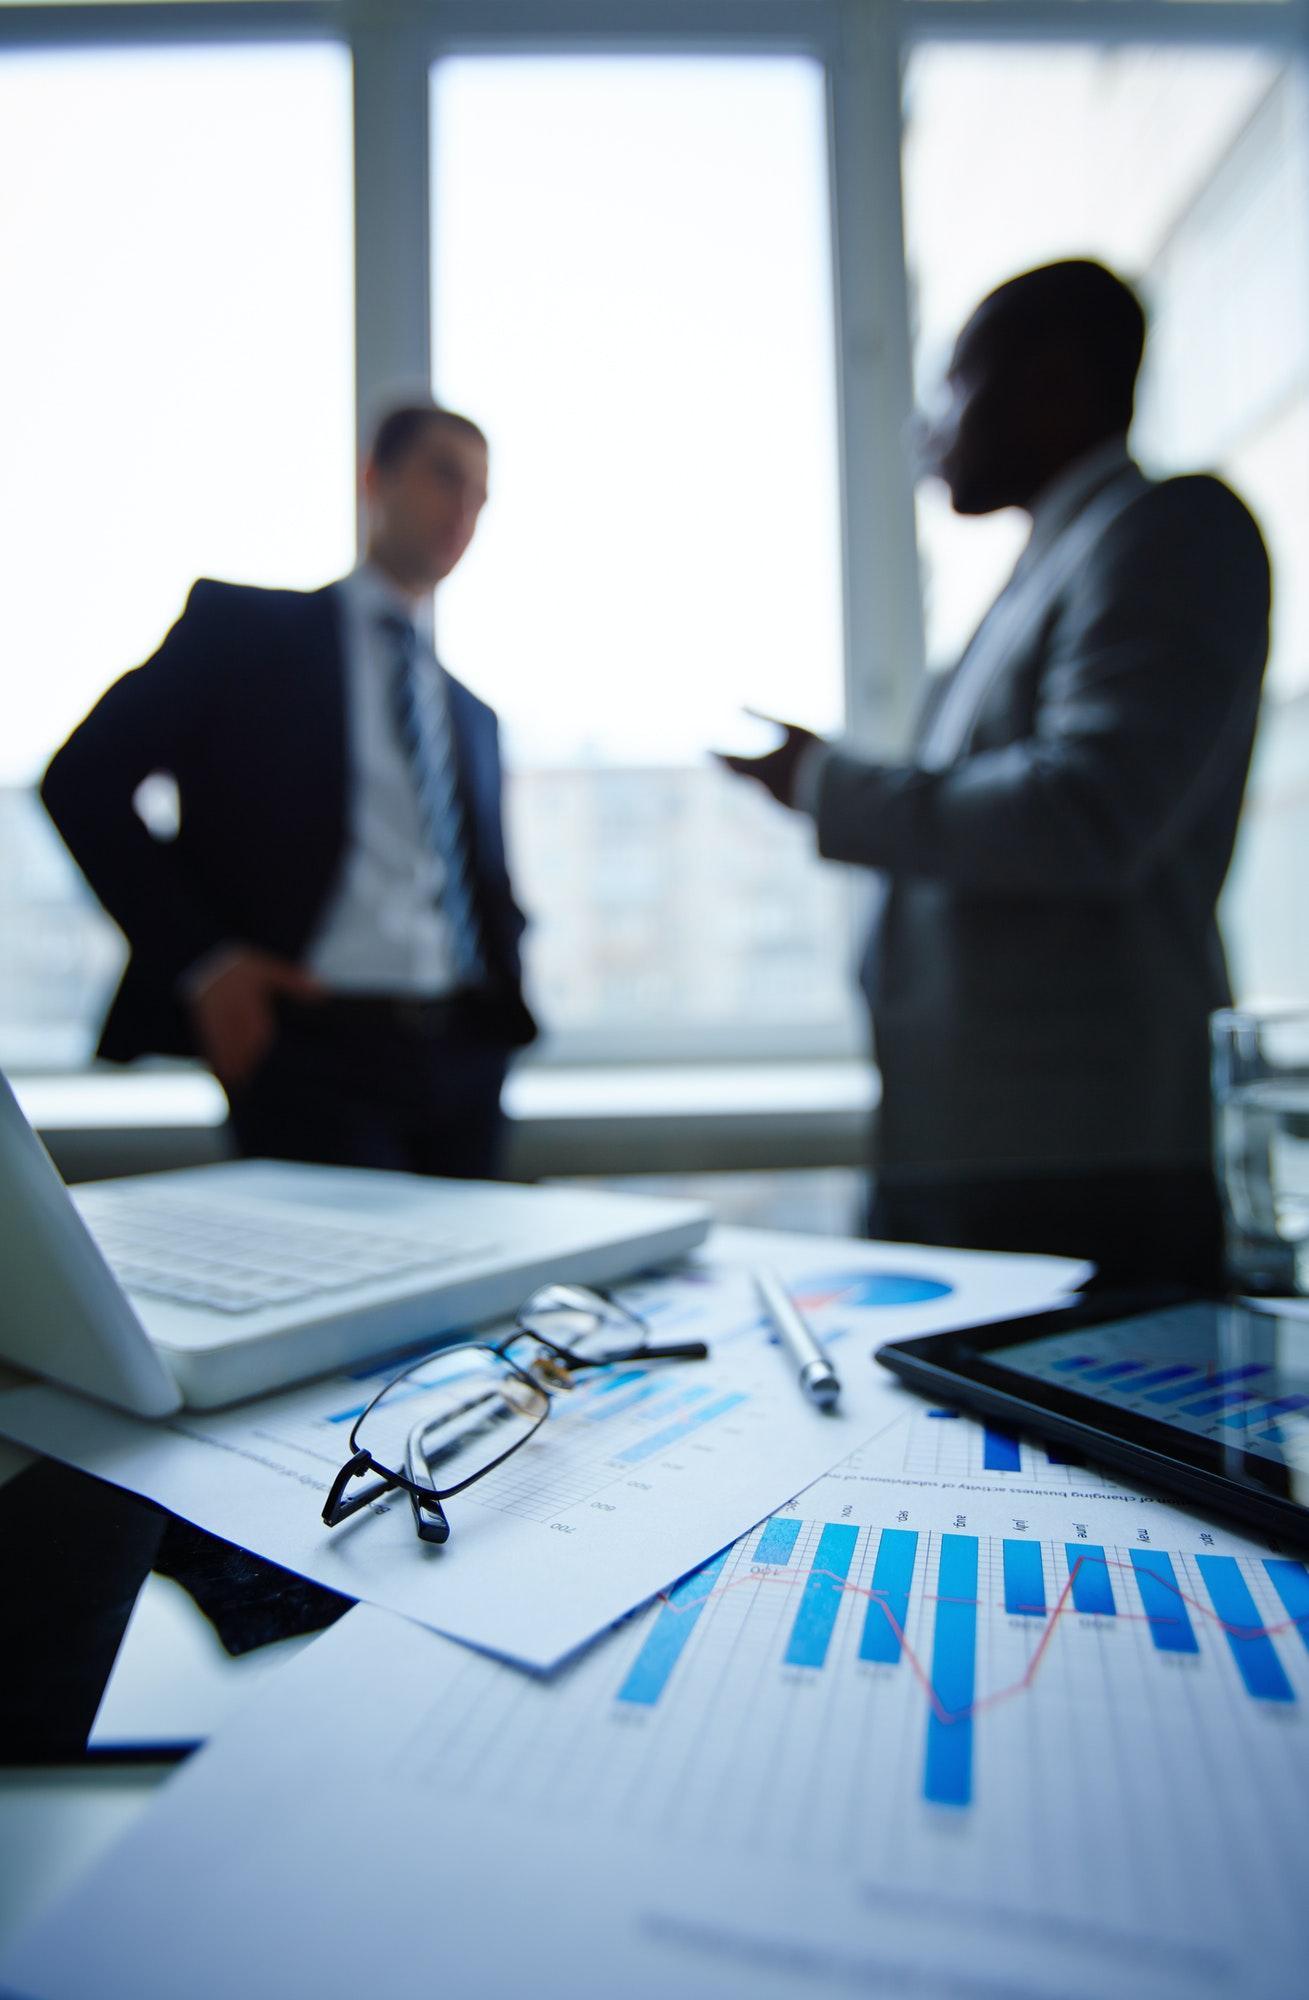 Business composition